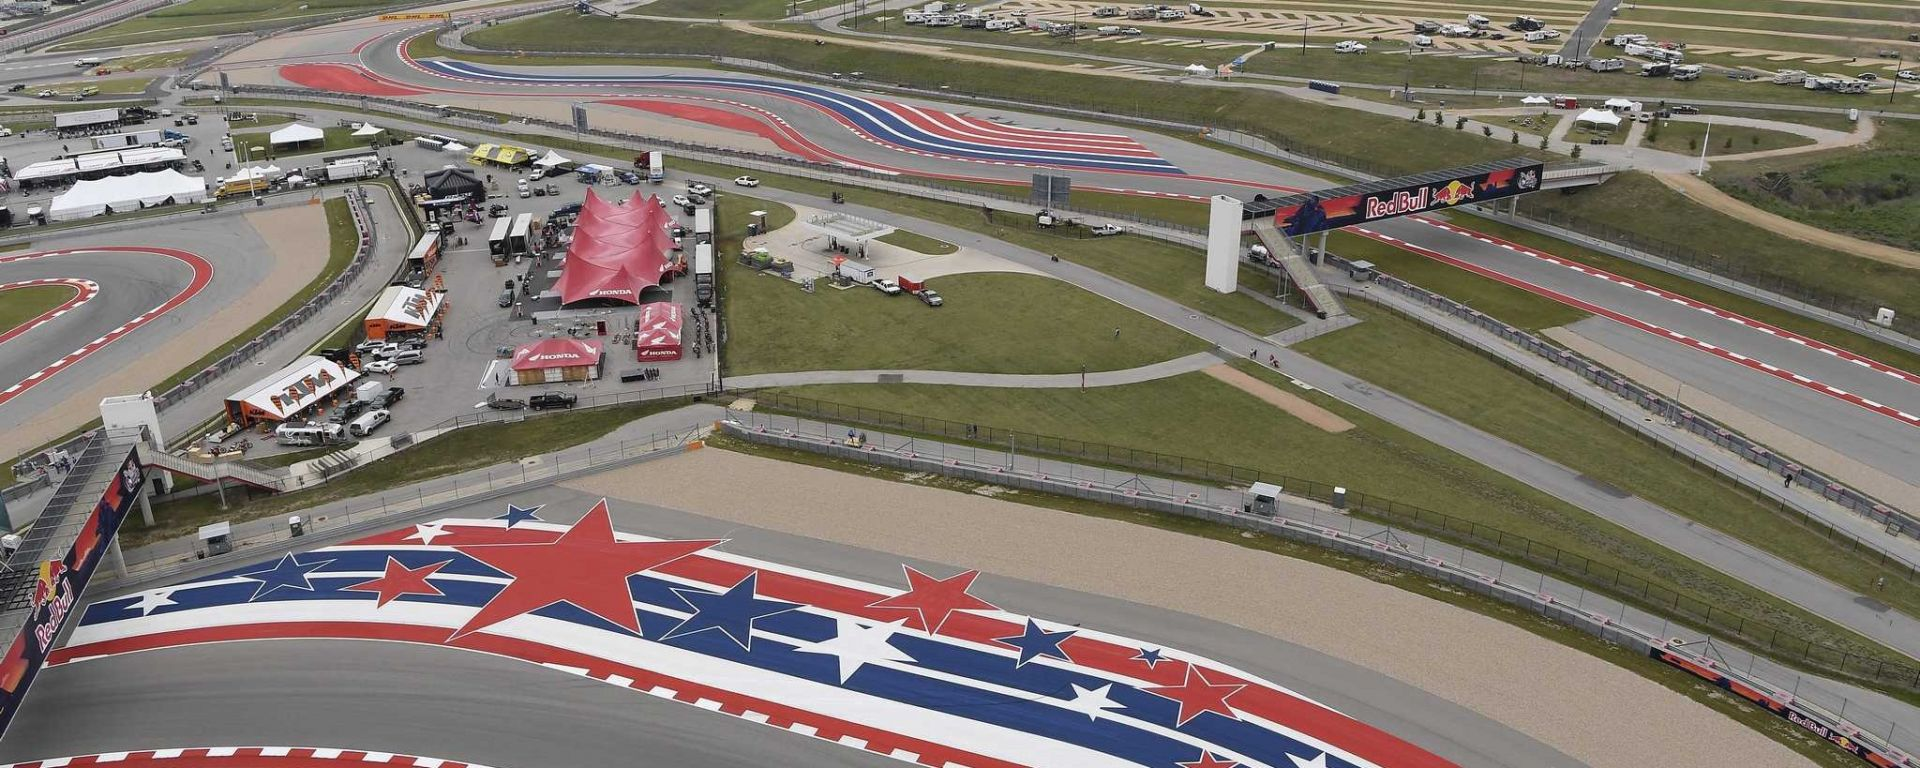 MotoGP Americas Stati Uniti: Prove libere, qualifiche, risultati gara